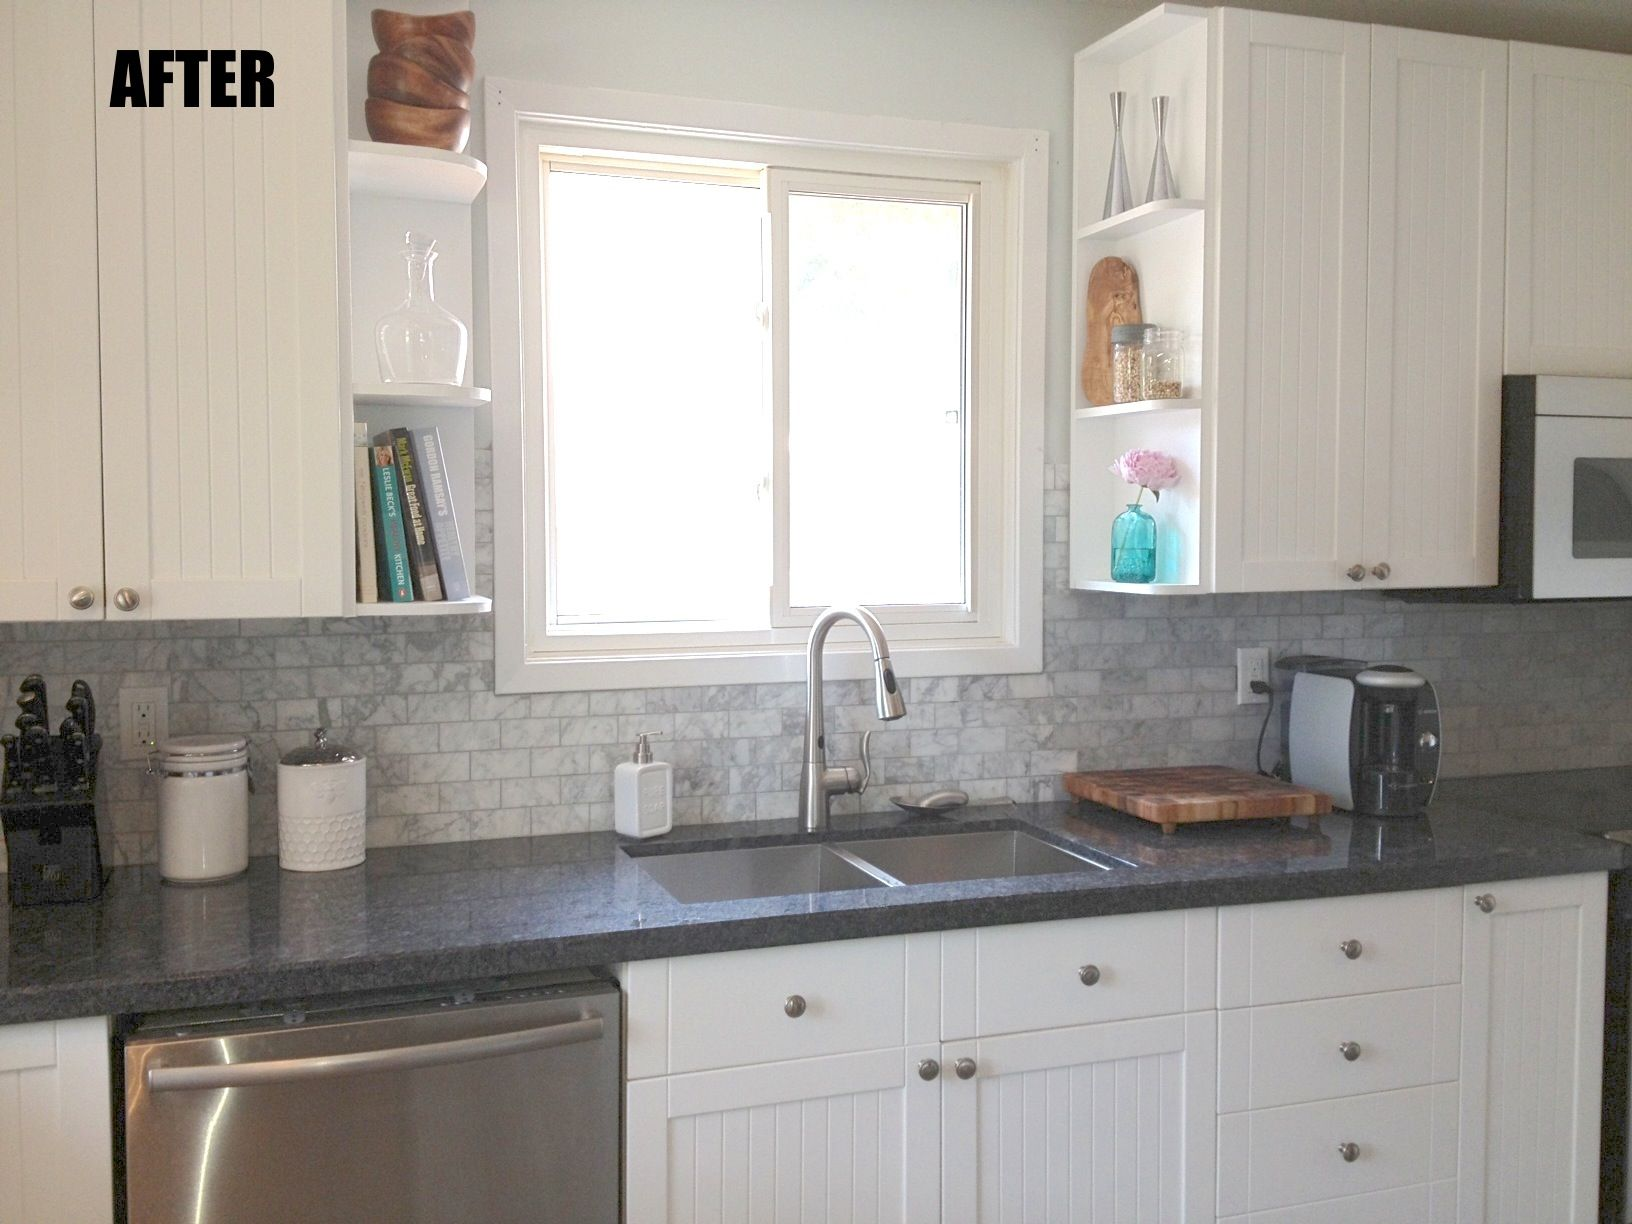 Interesting Grey Backsplash For Interior Kitchen Design